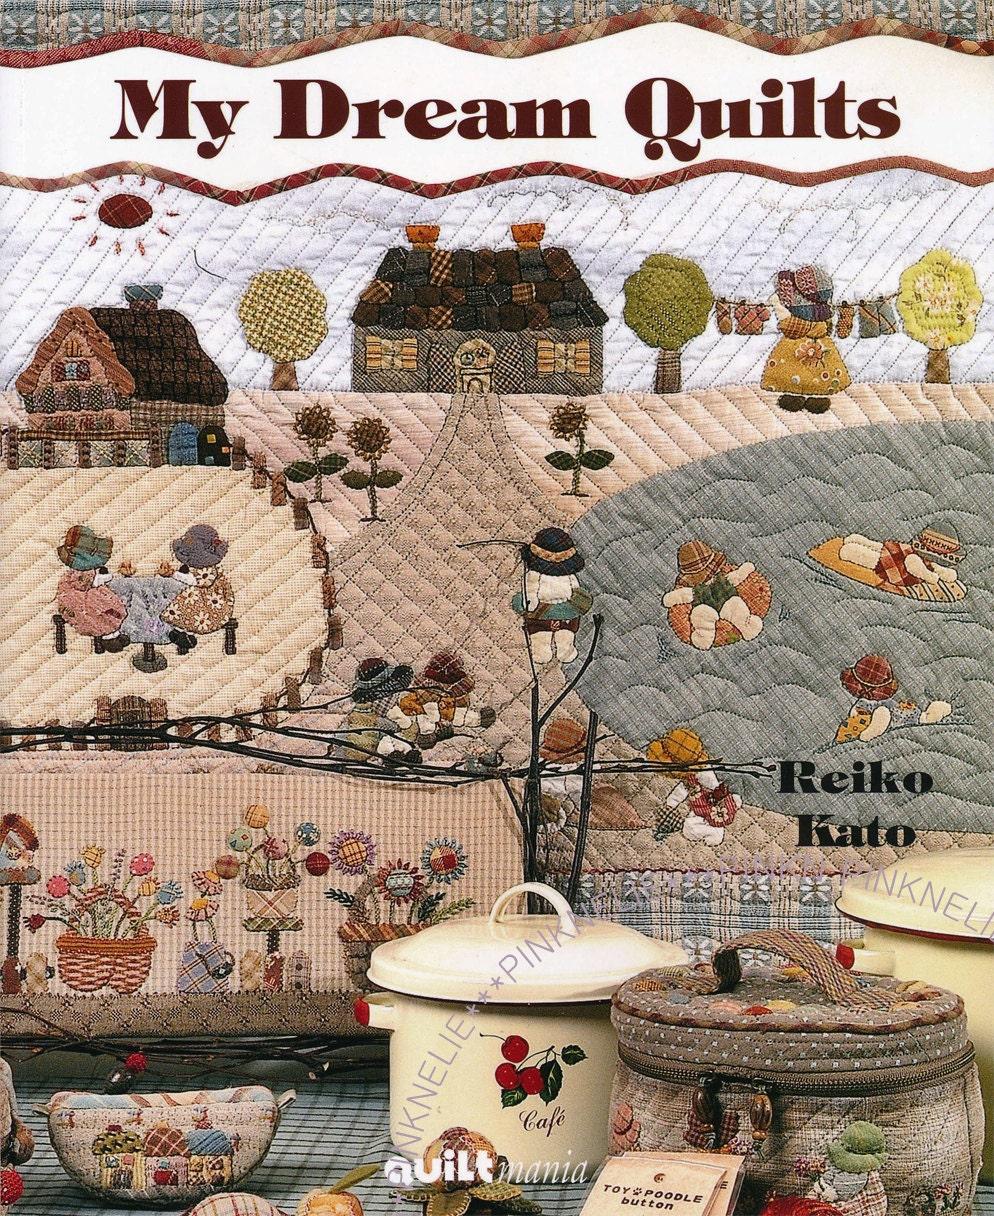 My dream quilts by reiko kato book hot girls wallpaper - Reiko kato patchwork ...